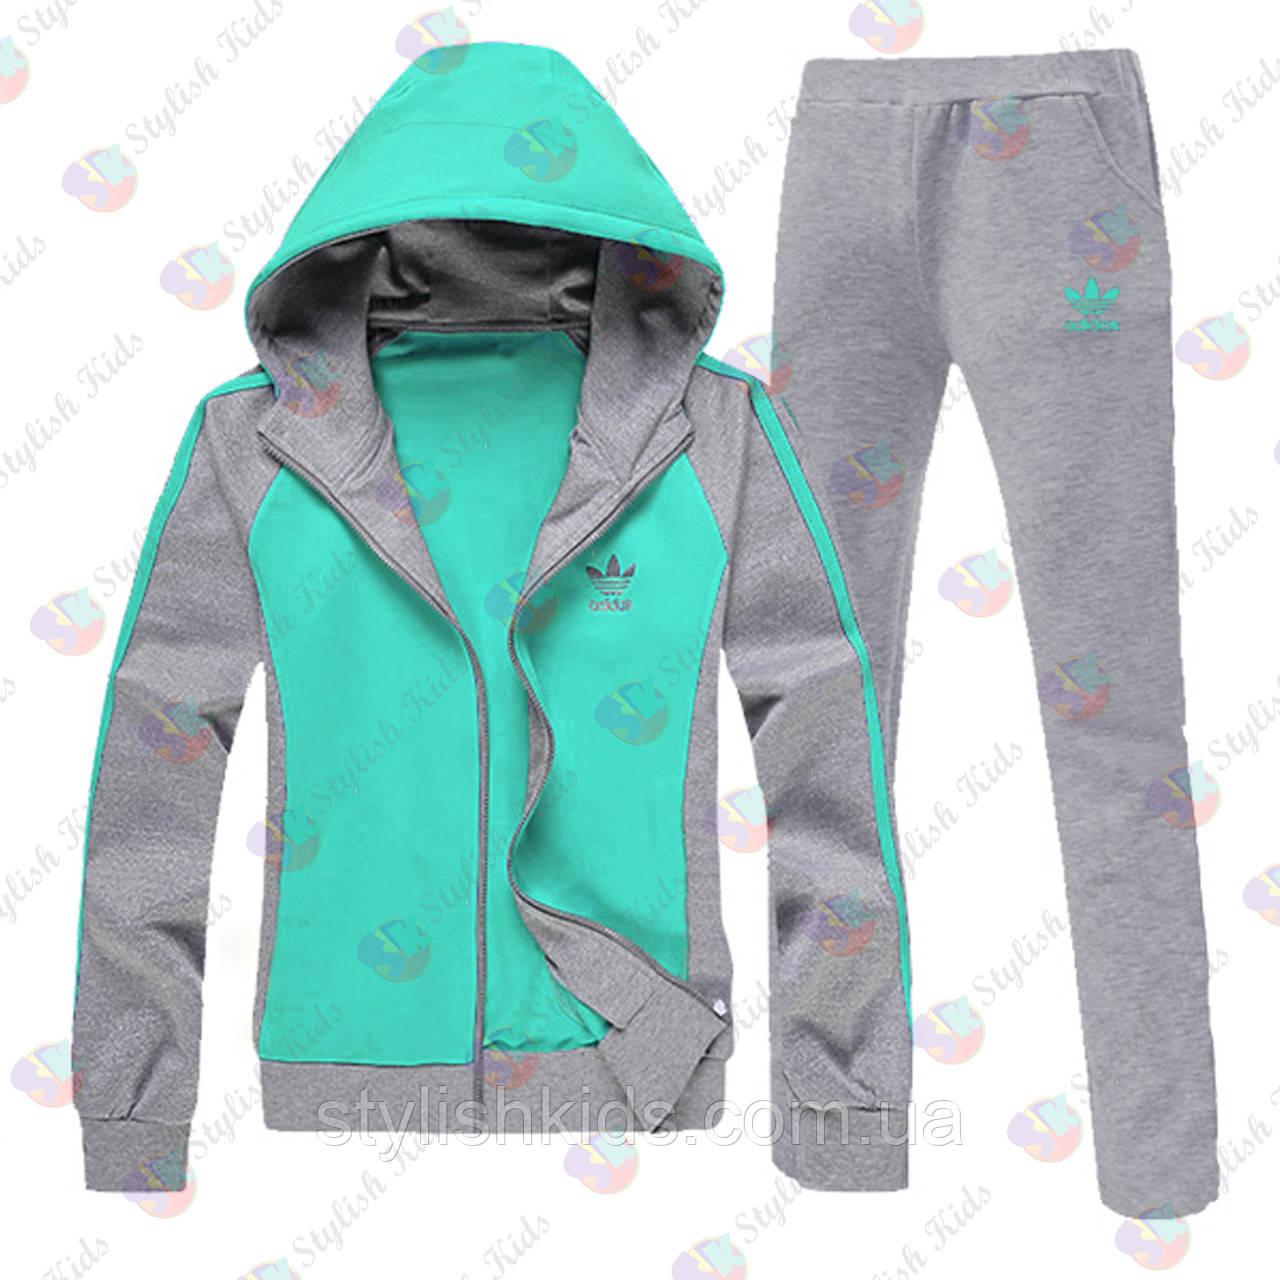 27ebe307f Спортивный костюм на девочку подросток 134р-164р adidas.Спортивный костюм  адидас купить в интернет